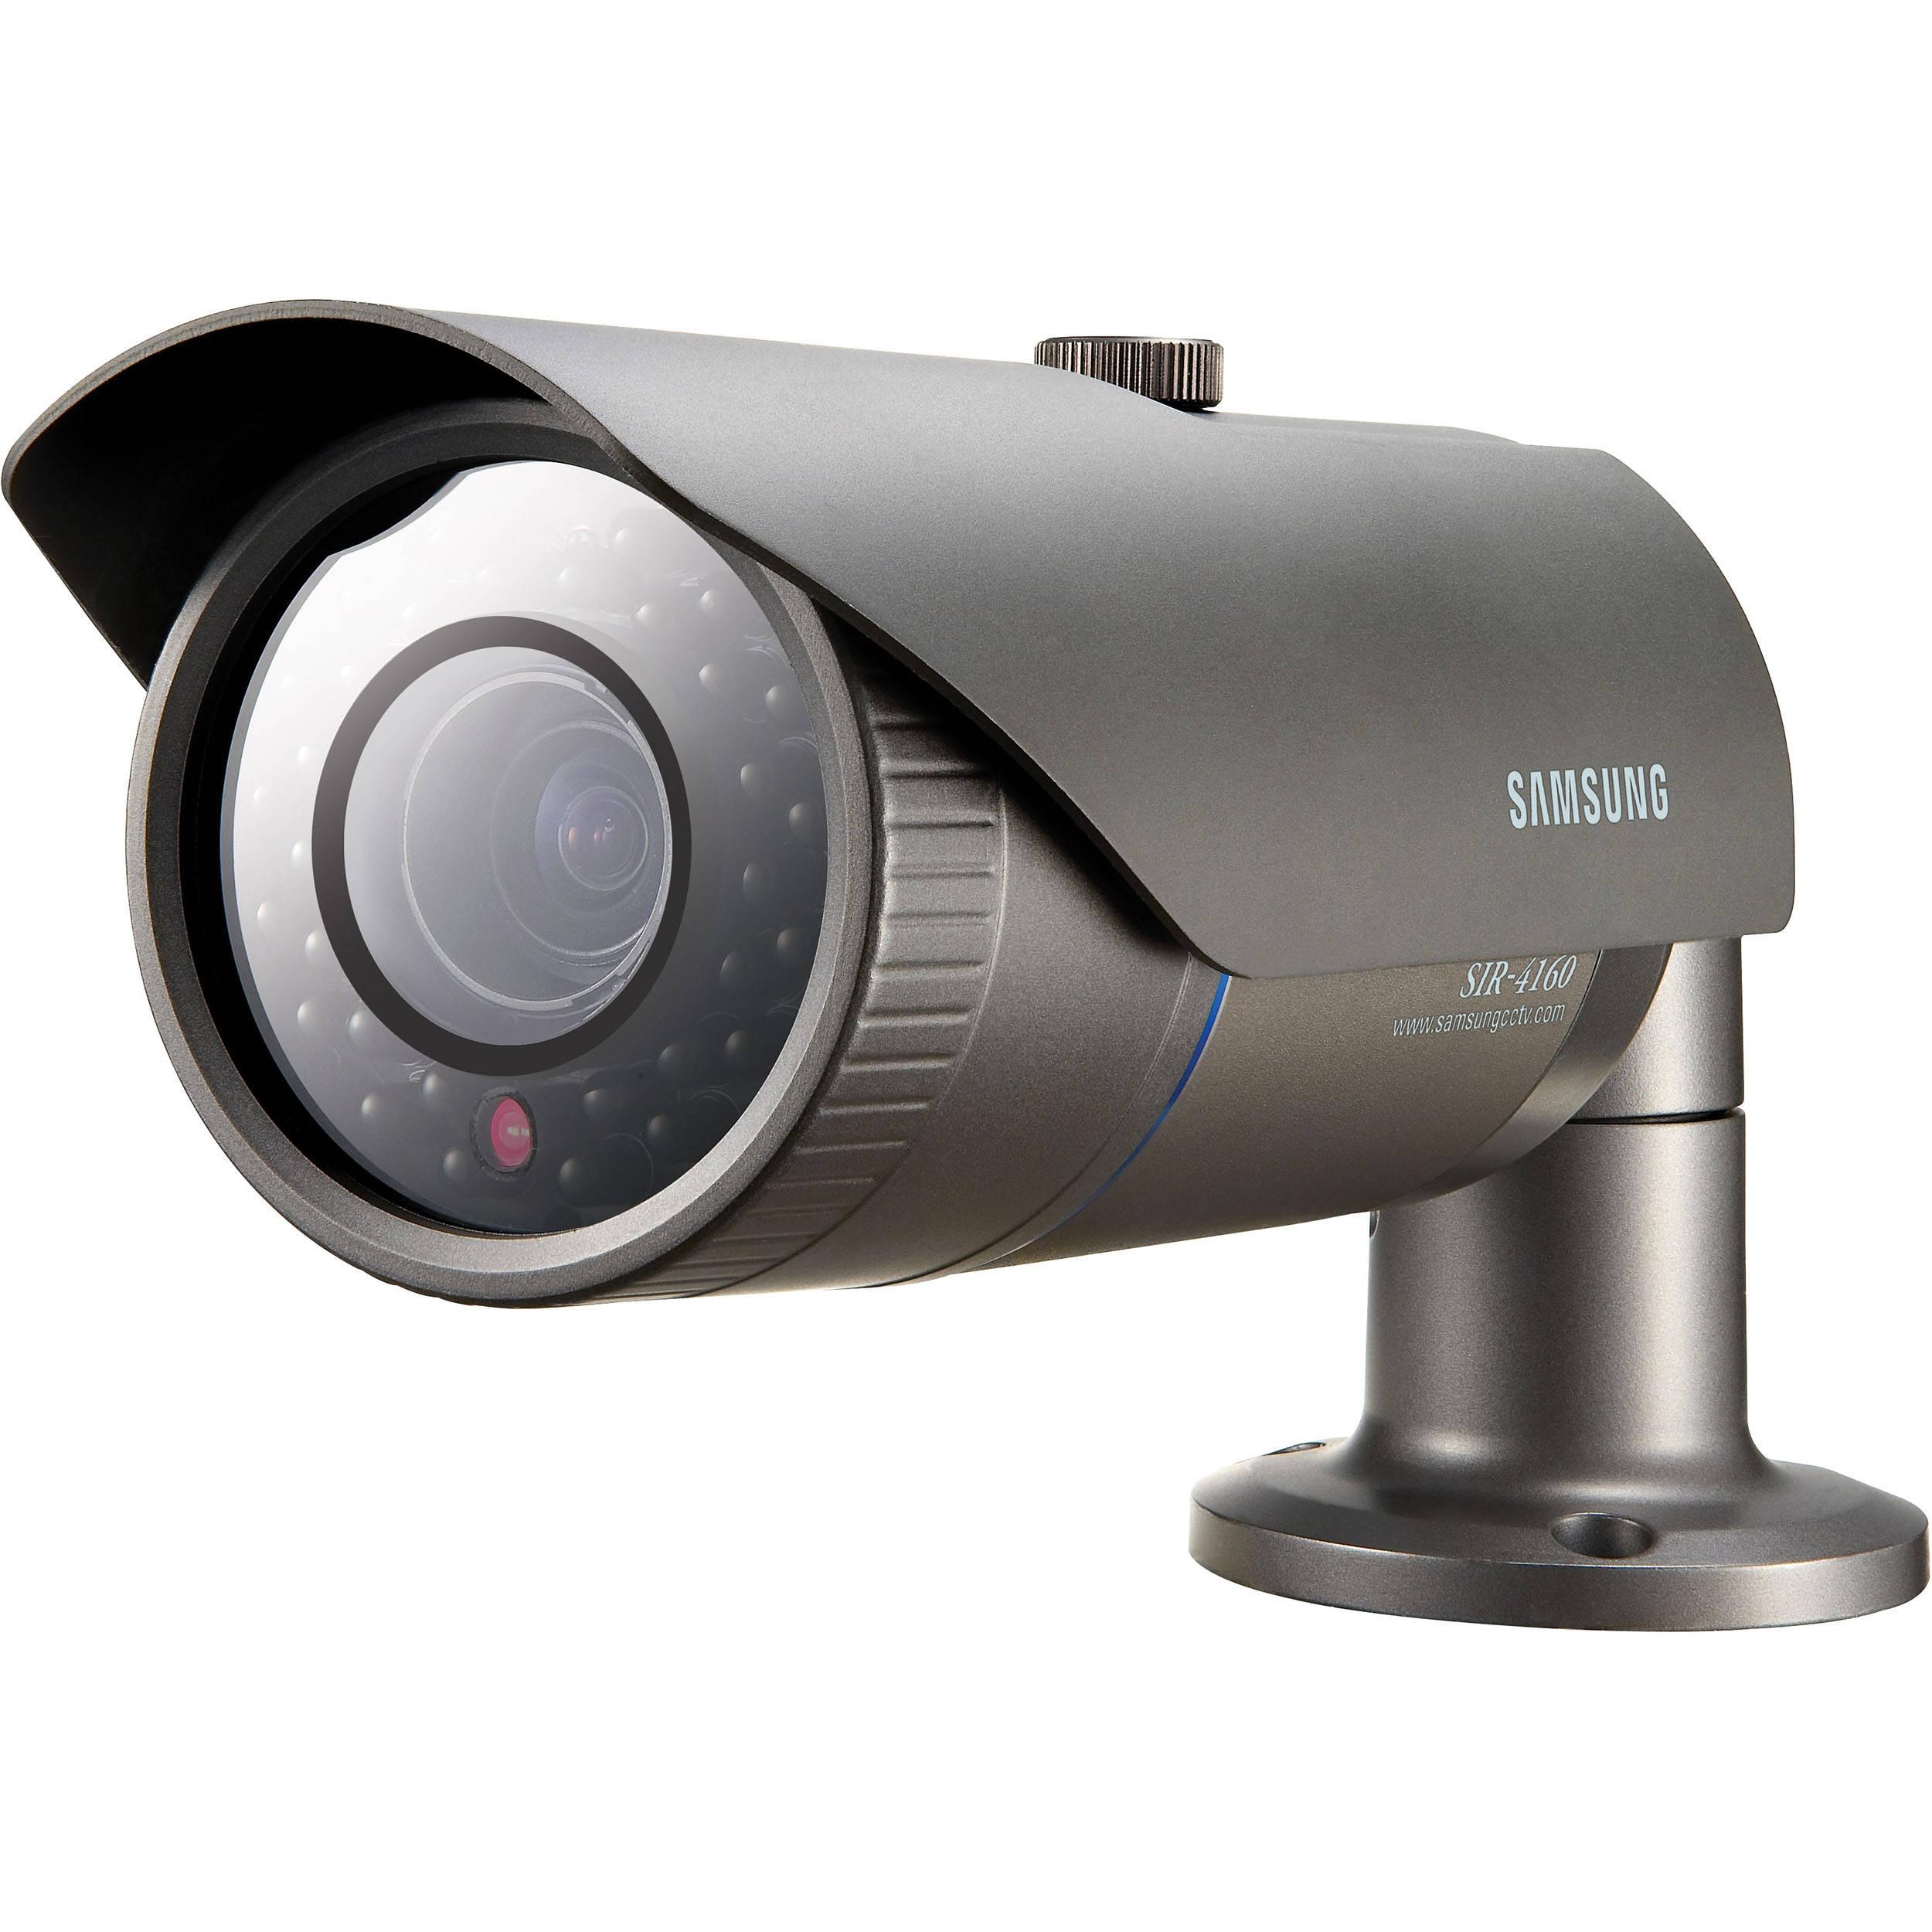 Samsung SCO-2120R High-resolution IR LED Camera (12x Zoom)